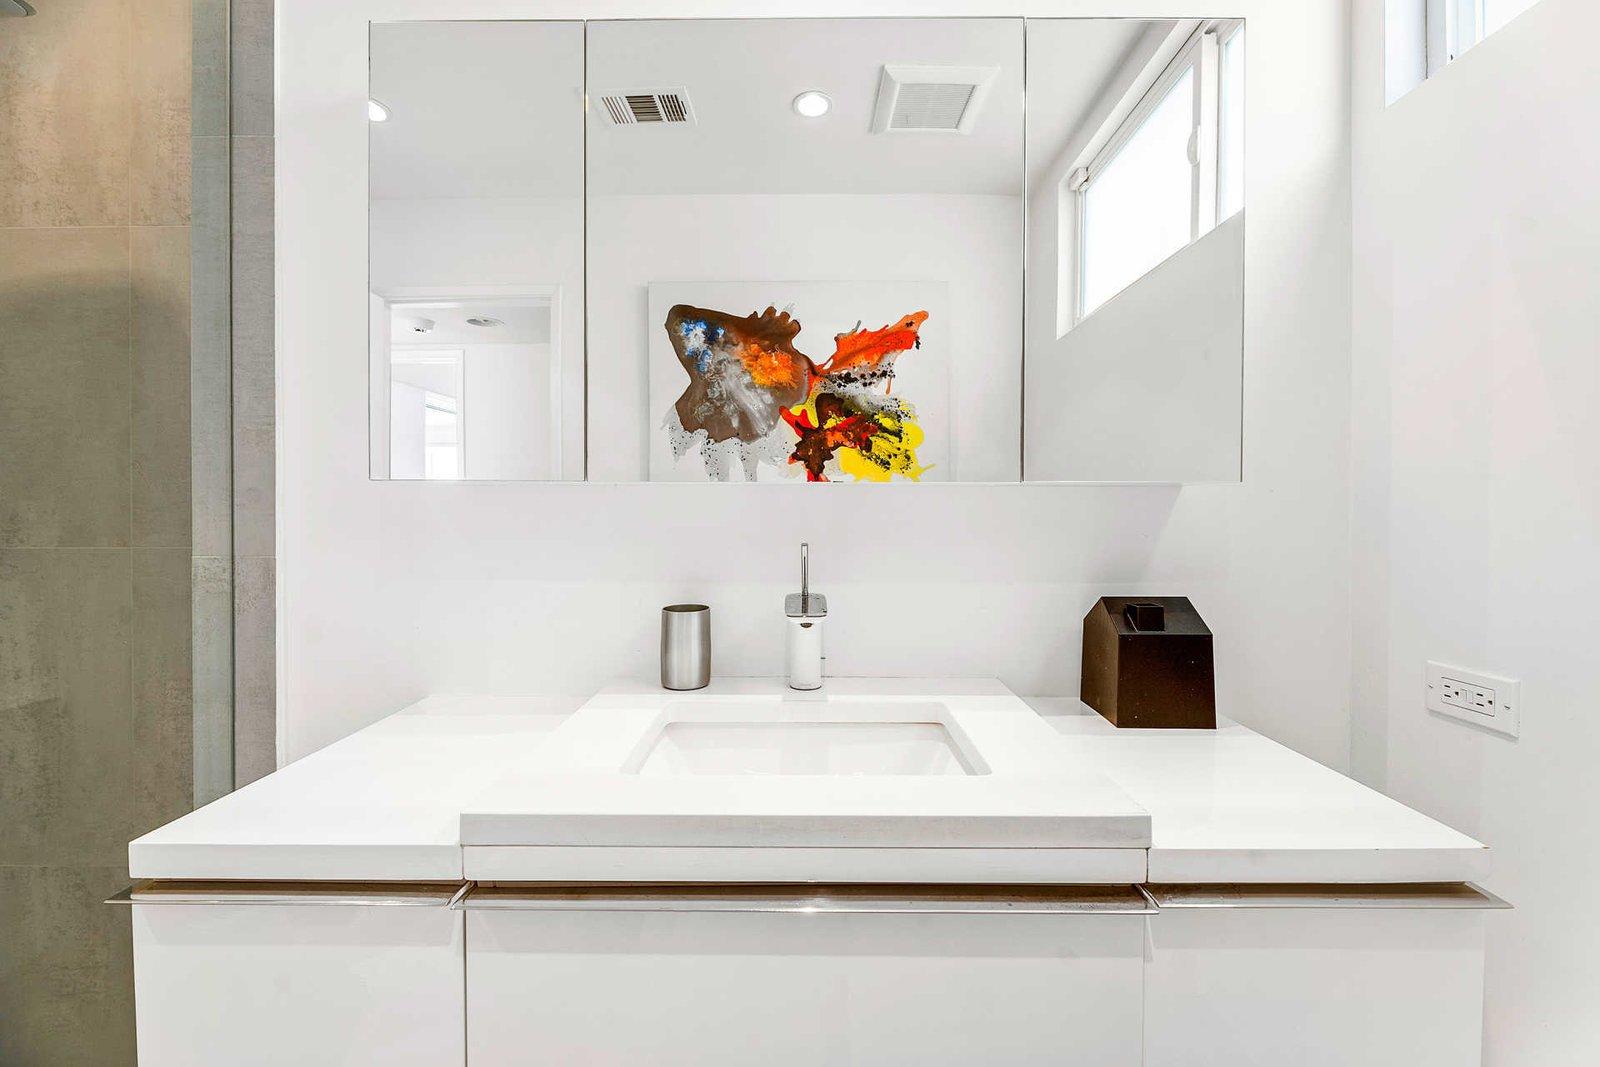 Richard Neutra Platform House bathroom